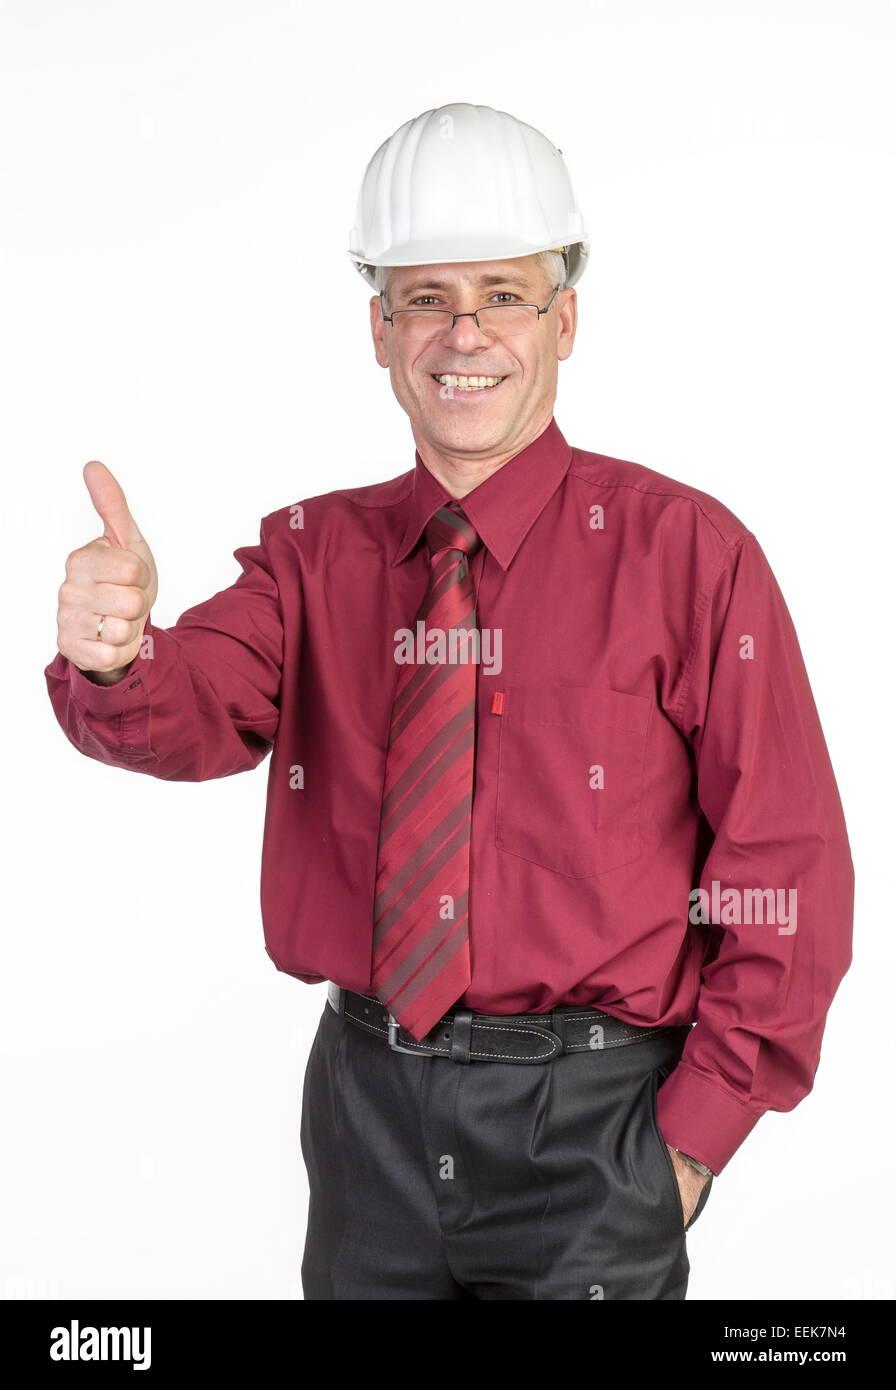 Architekt mit Helm hält Architekt Daumen hoch, con cascos de seguridad mantiene el pulgar Foto de stock